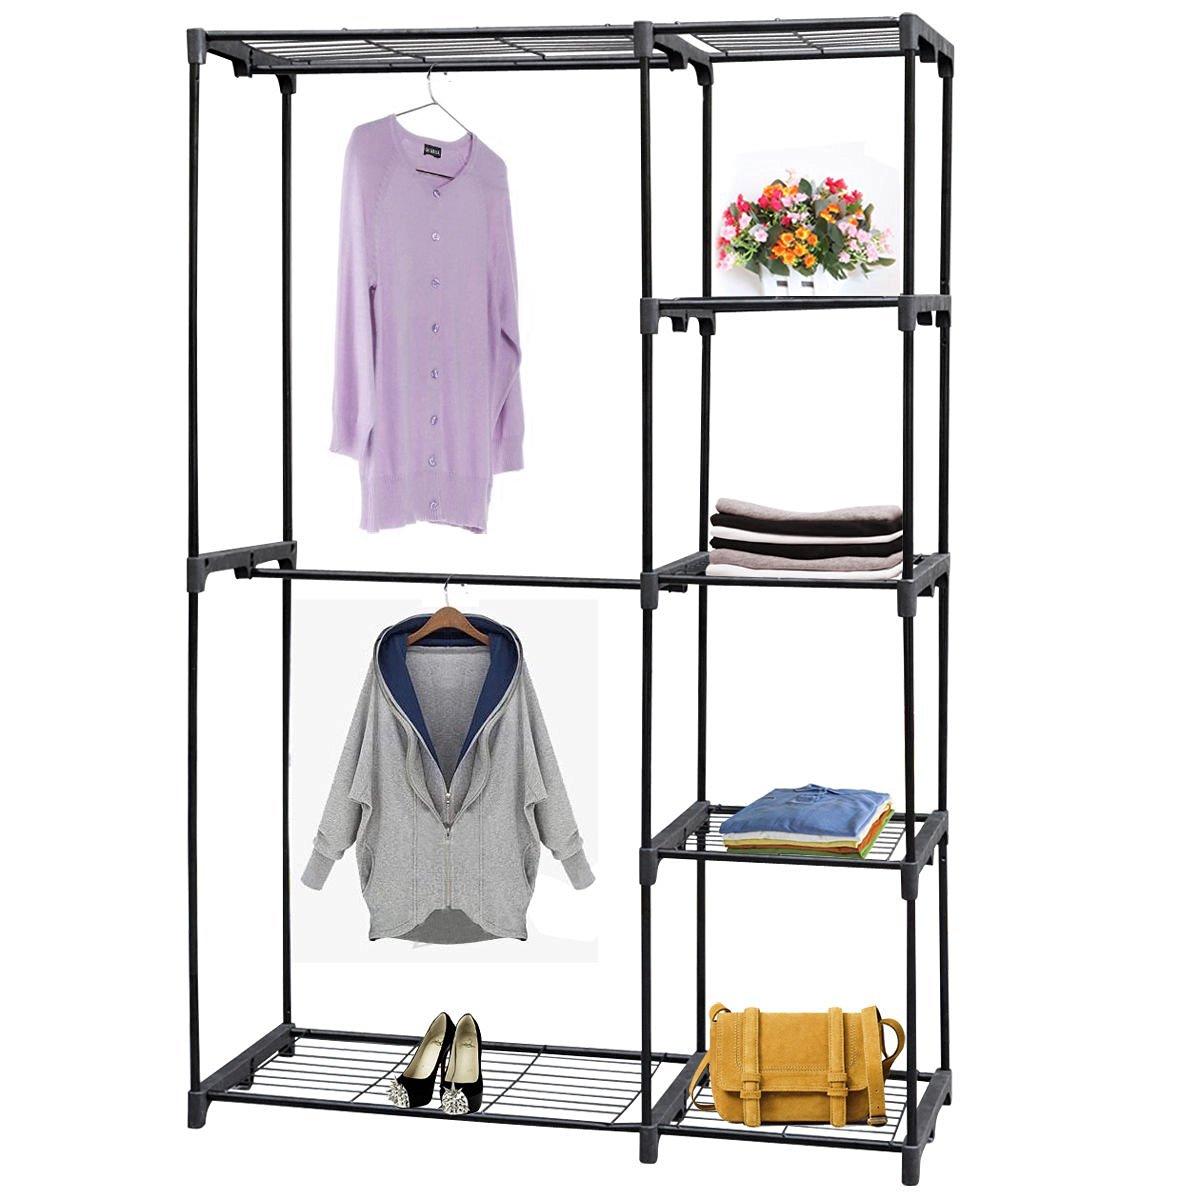 Cheap Portable Garment Closet Find Portable Garment Closet Deals On